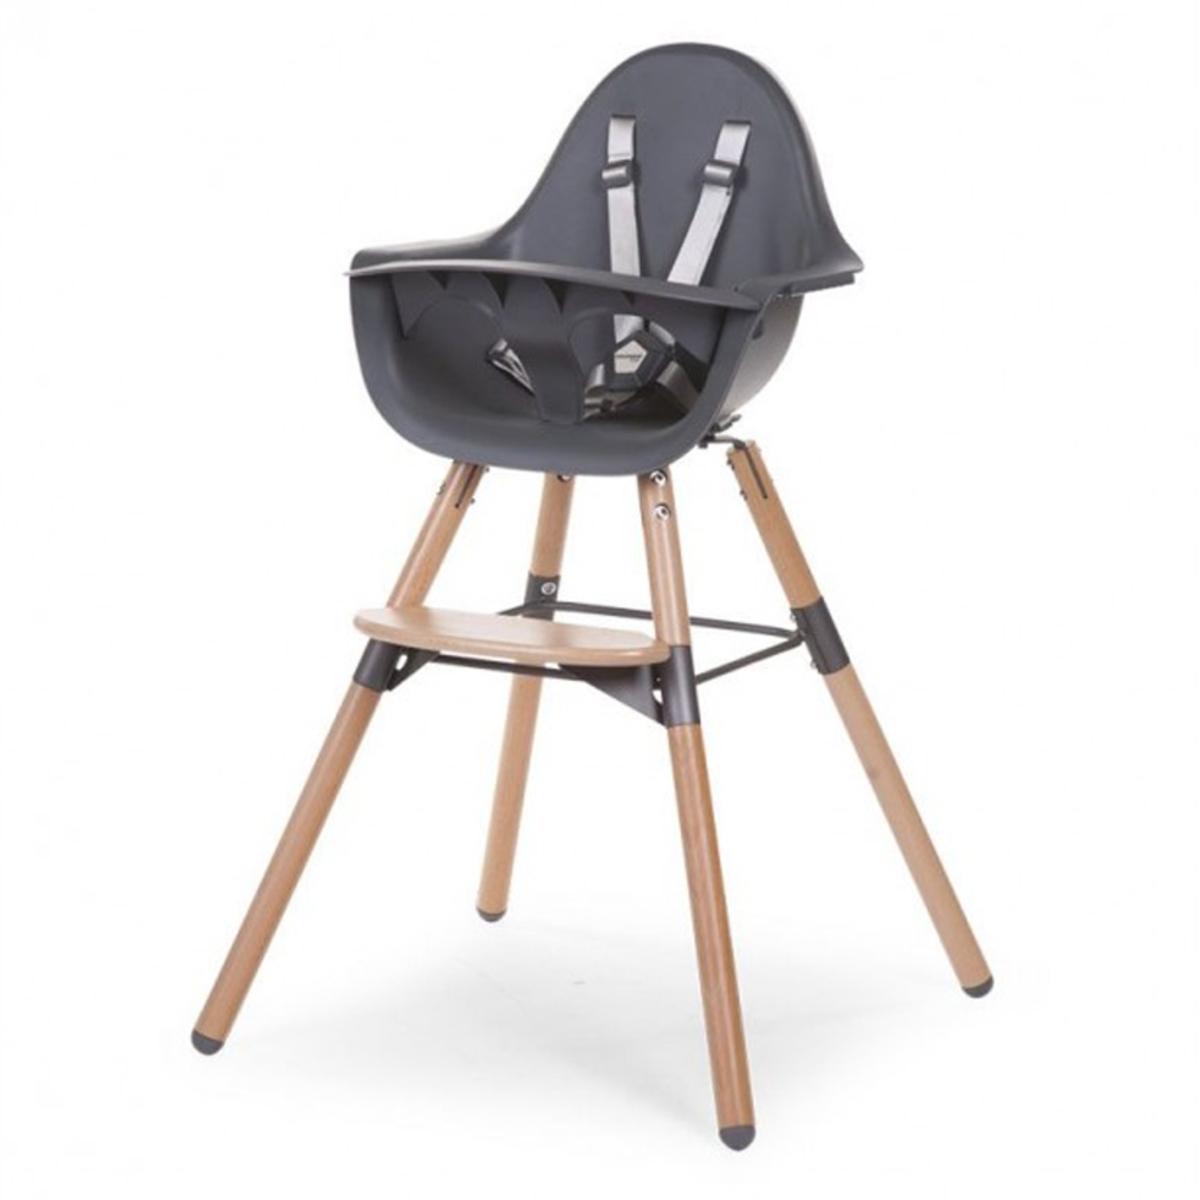 Chaise haute Chaise Haute Evolu 2 Pieds Bois - Anthracite Chaise Haute Evolu 2 Pieds Bois - Anthracite